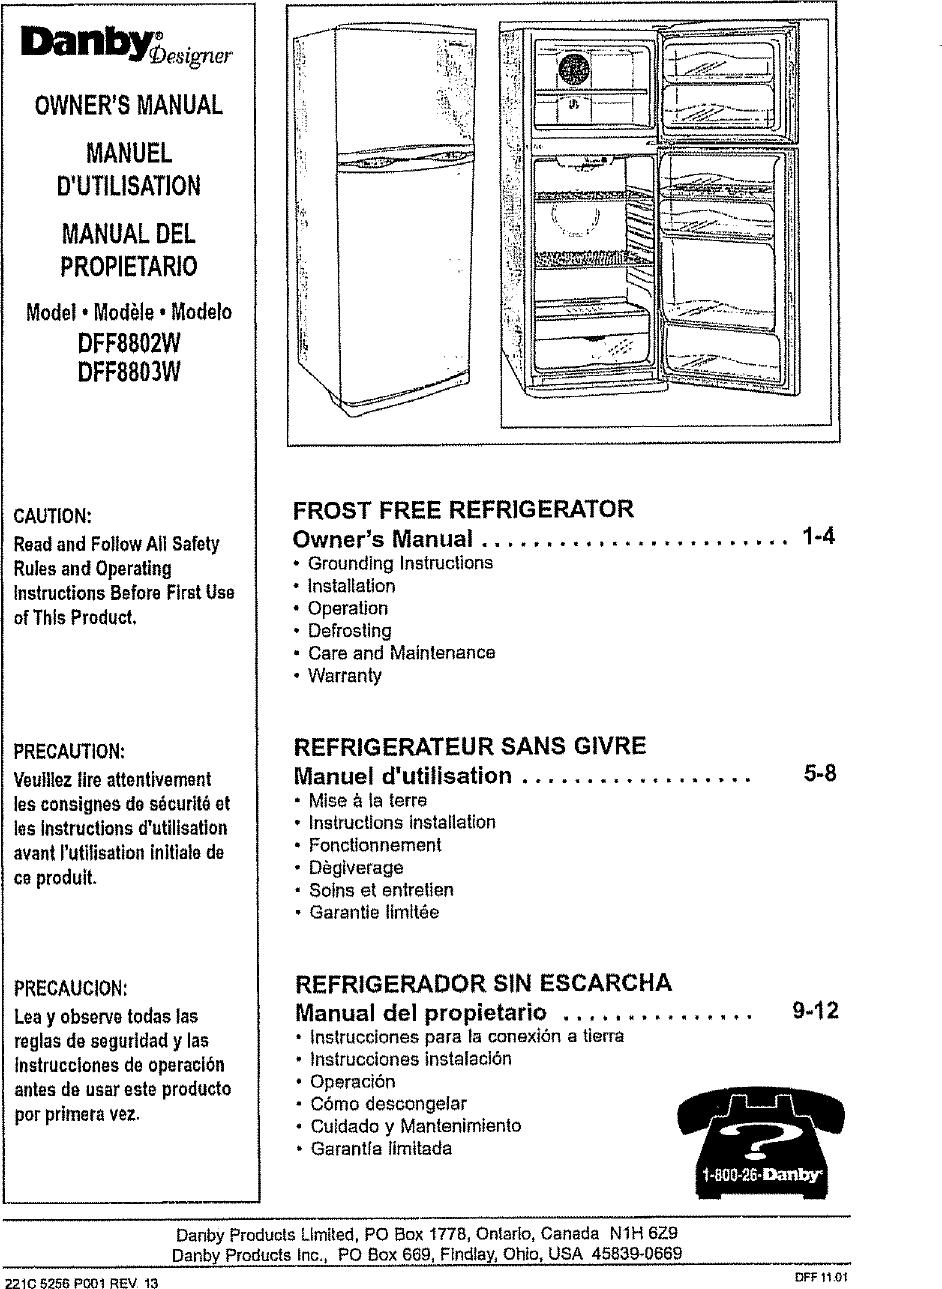 danby dff8803w user manual refrigerator manuals and guides l0712296 rh usermanual wiki Appliance Gas Range Danby Appliances Logo